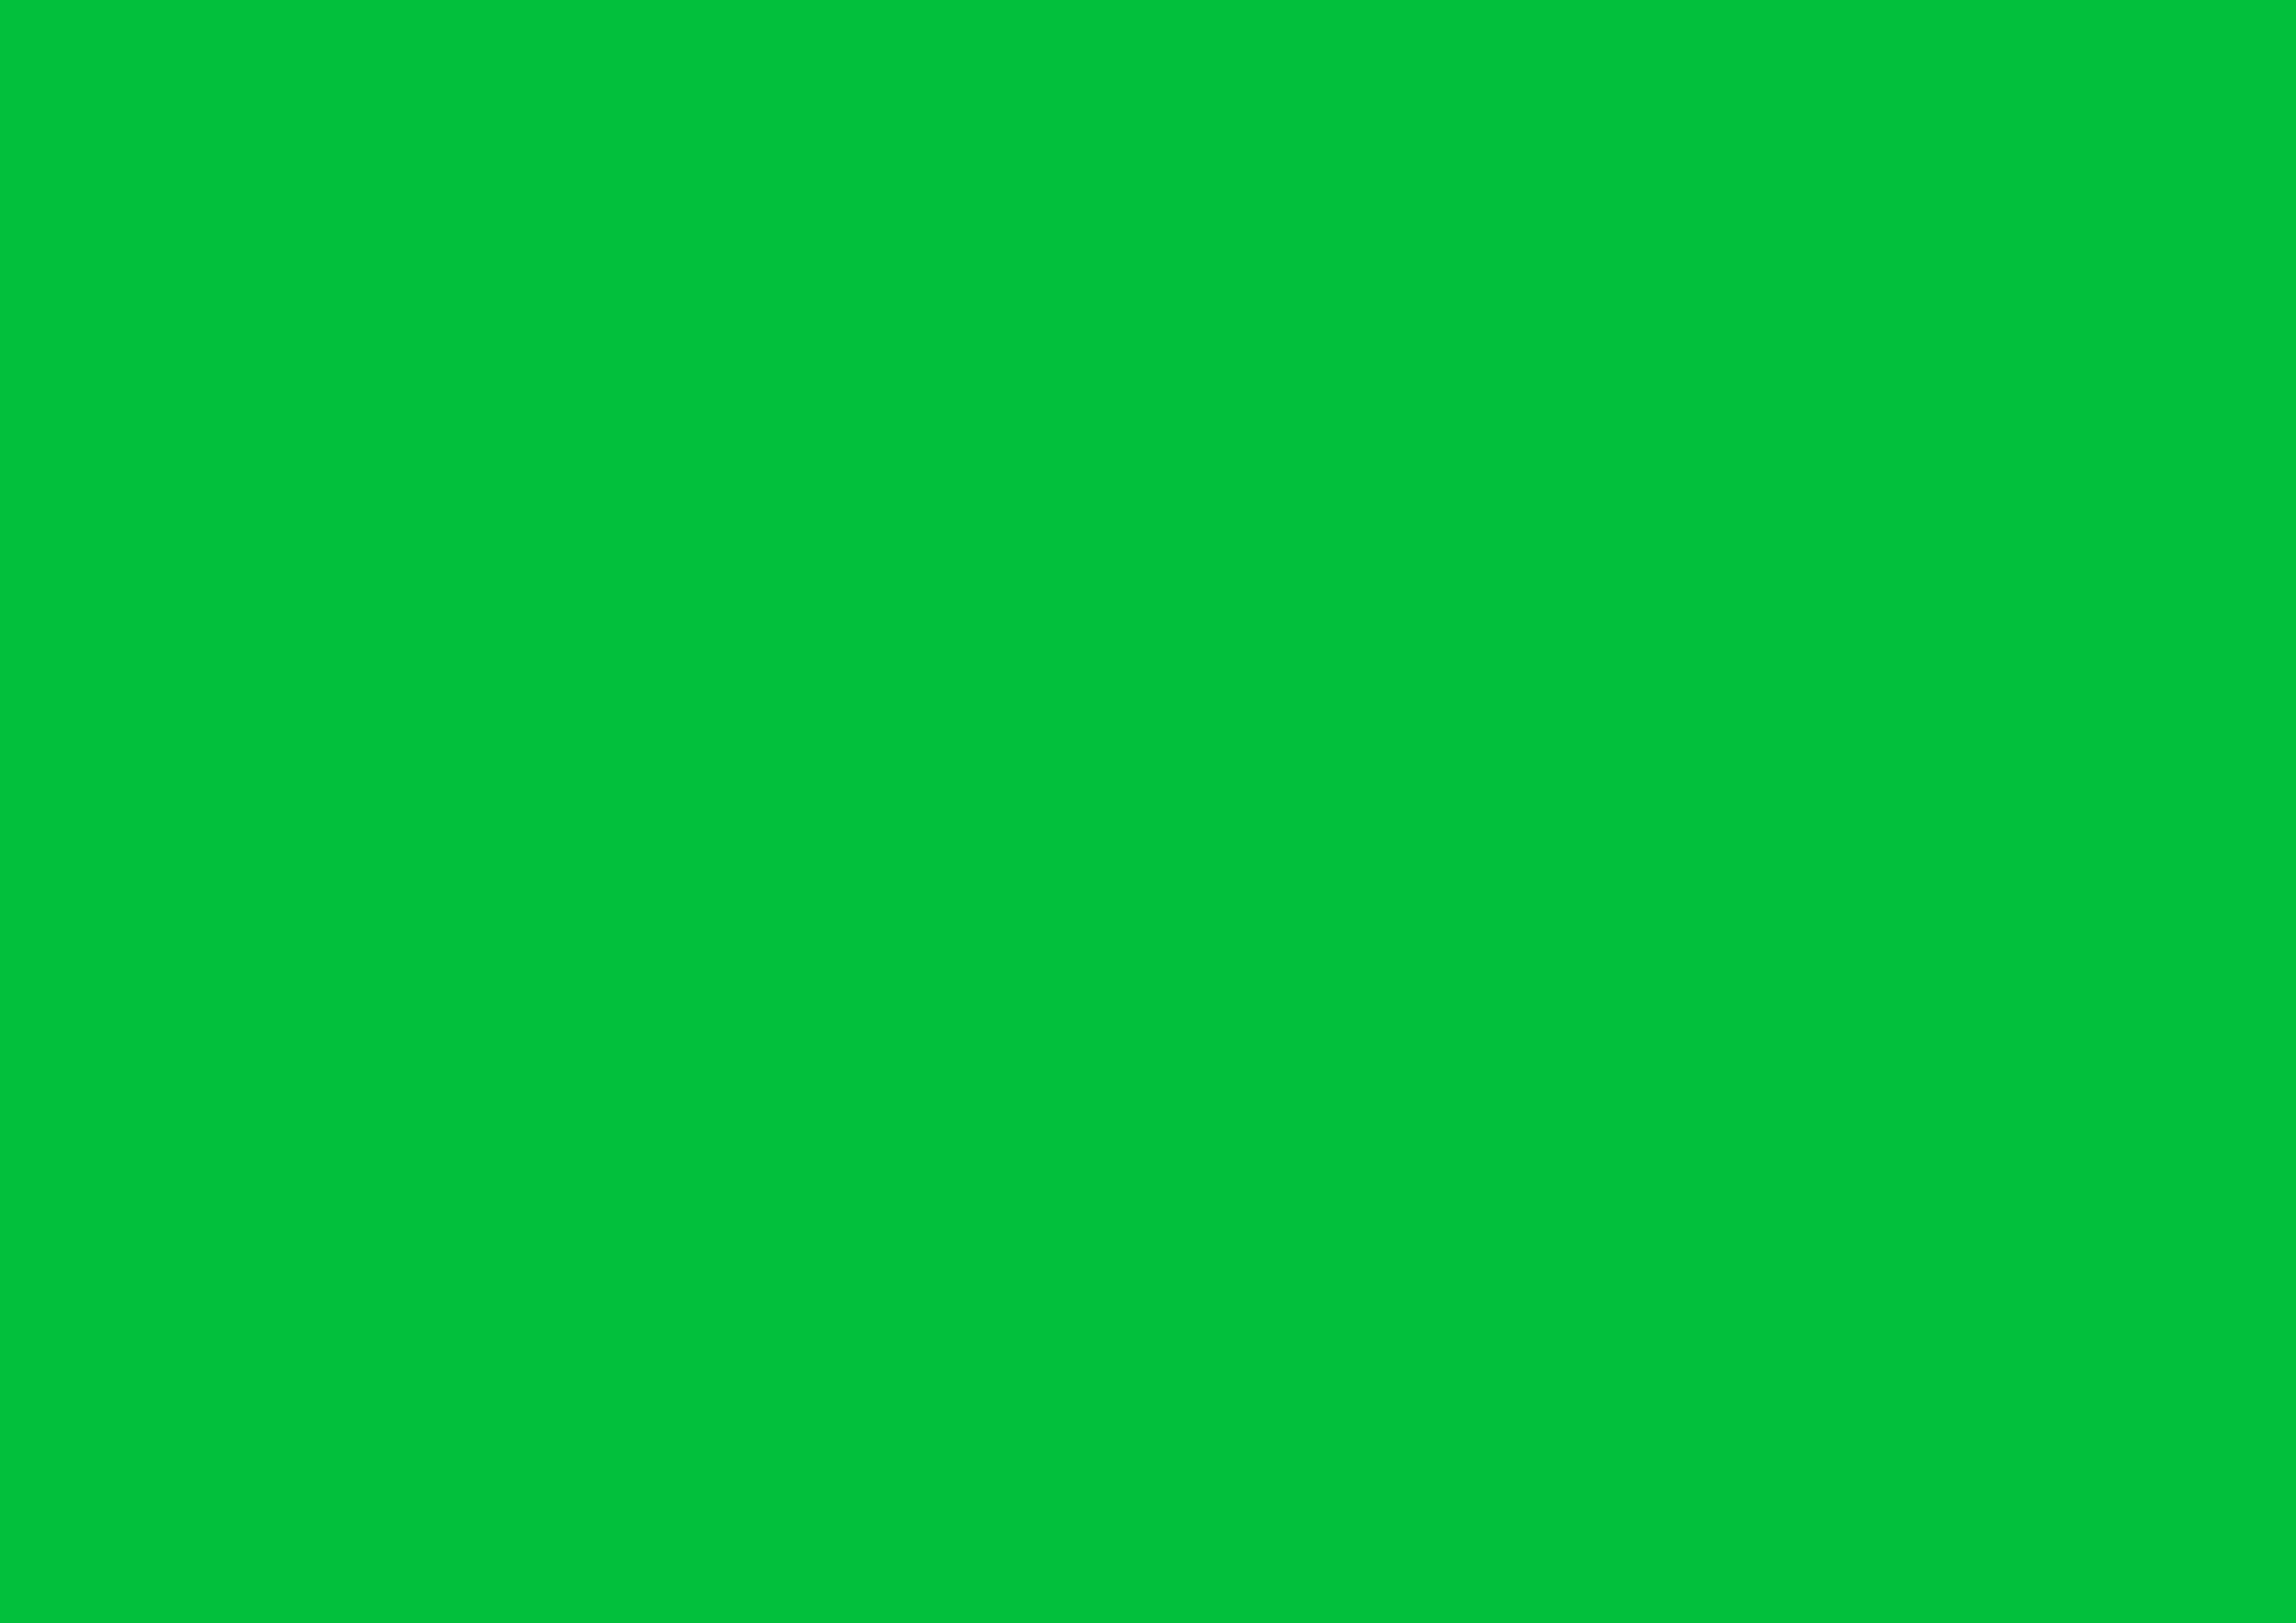 3508x2480 Dark Pastel Green Solid Color Background